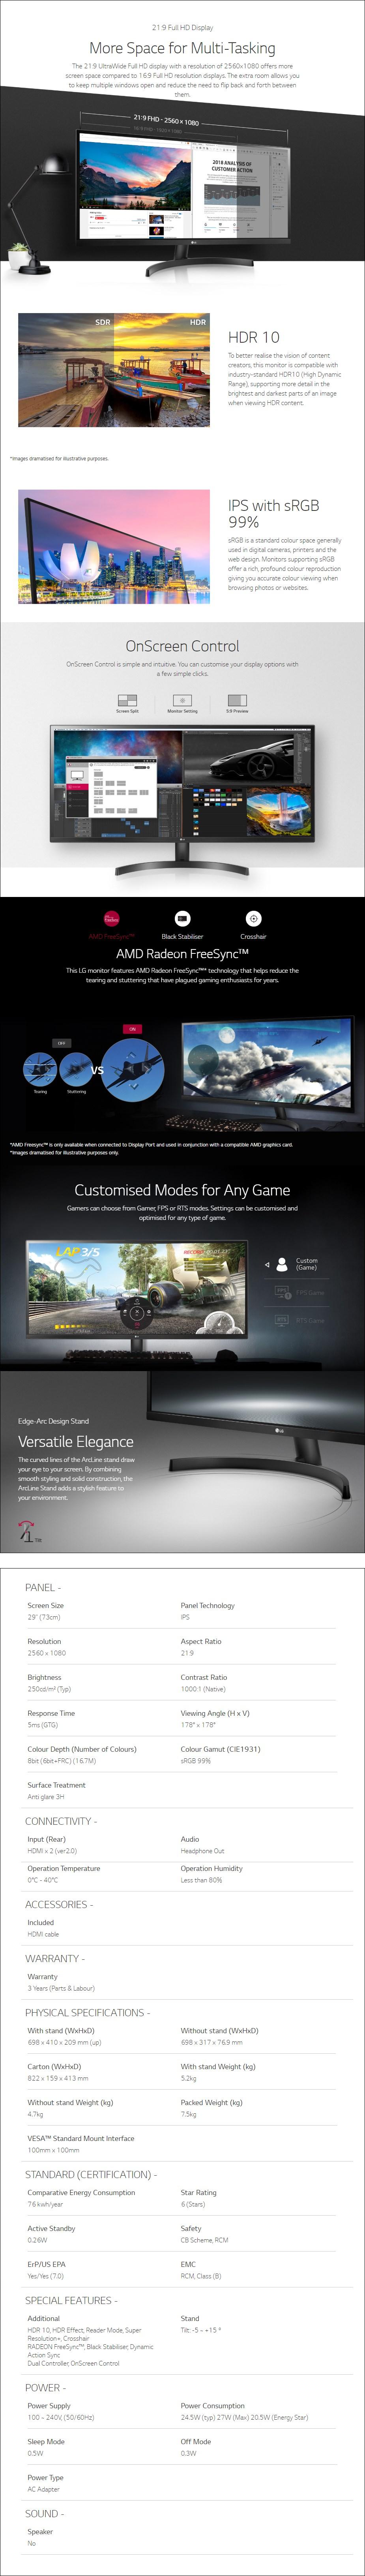 "LG 29WL500-B 29"" Ultra-Wide Full HD HDR10 sRGB 99% FreeSync IPS Monitor - Overview 1"